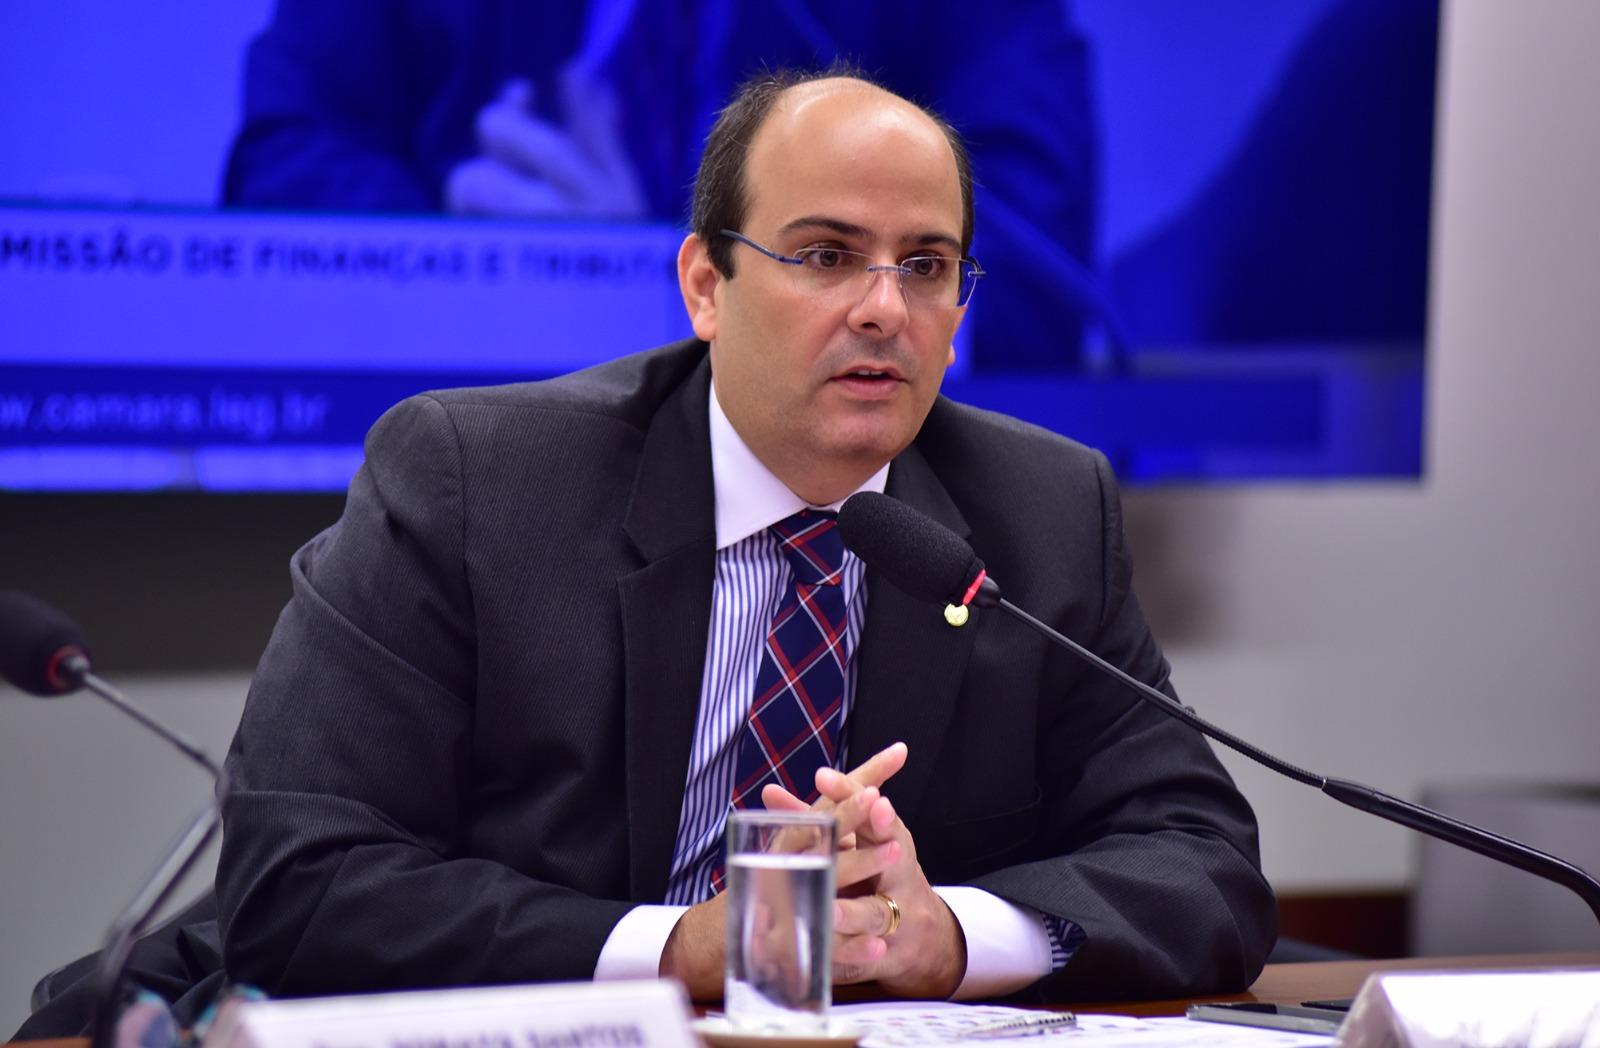 Deputado ALEXANDRE VALLE (PR-RJ)